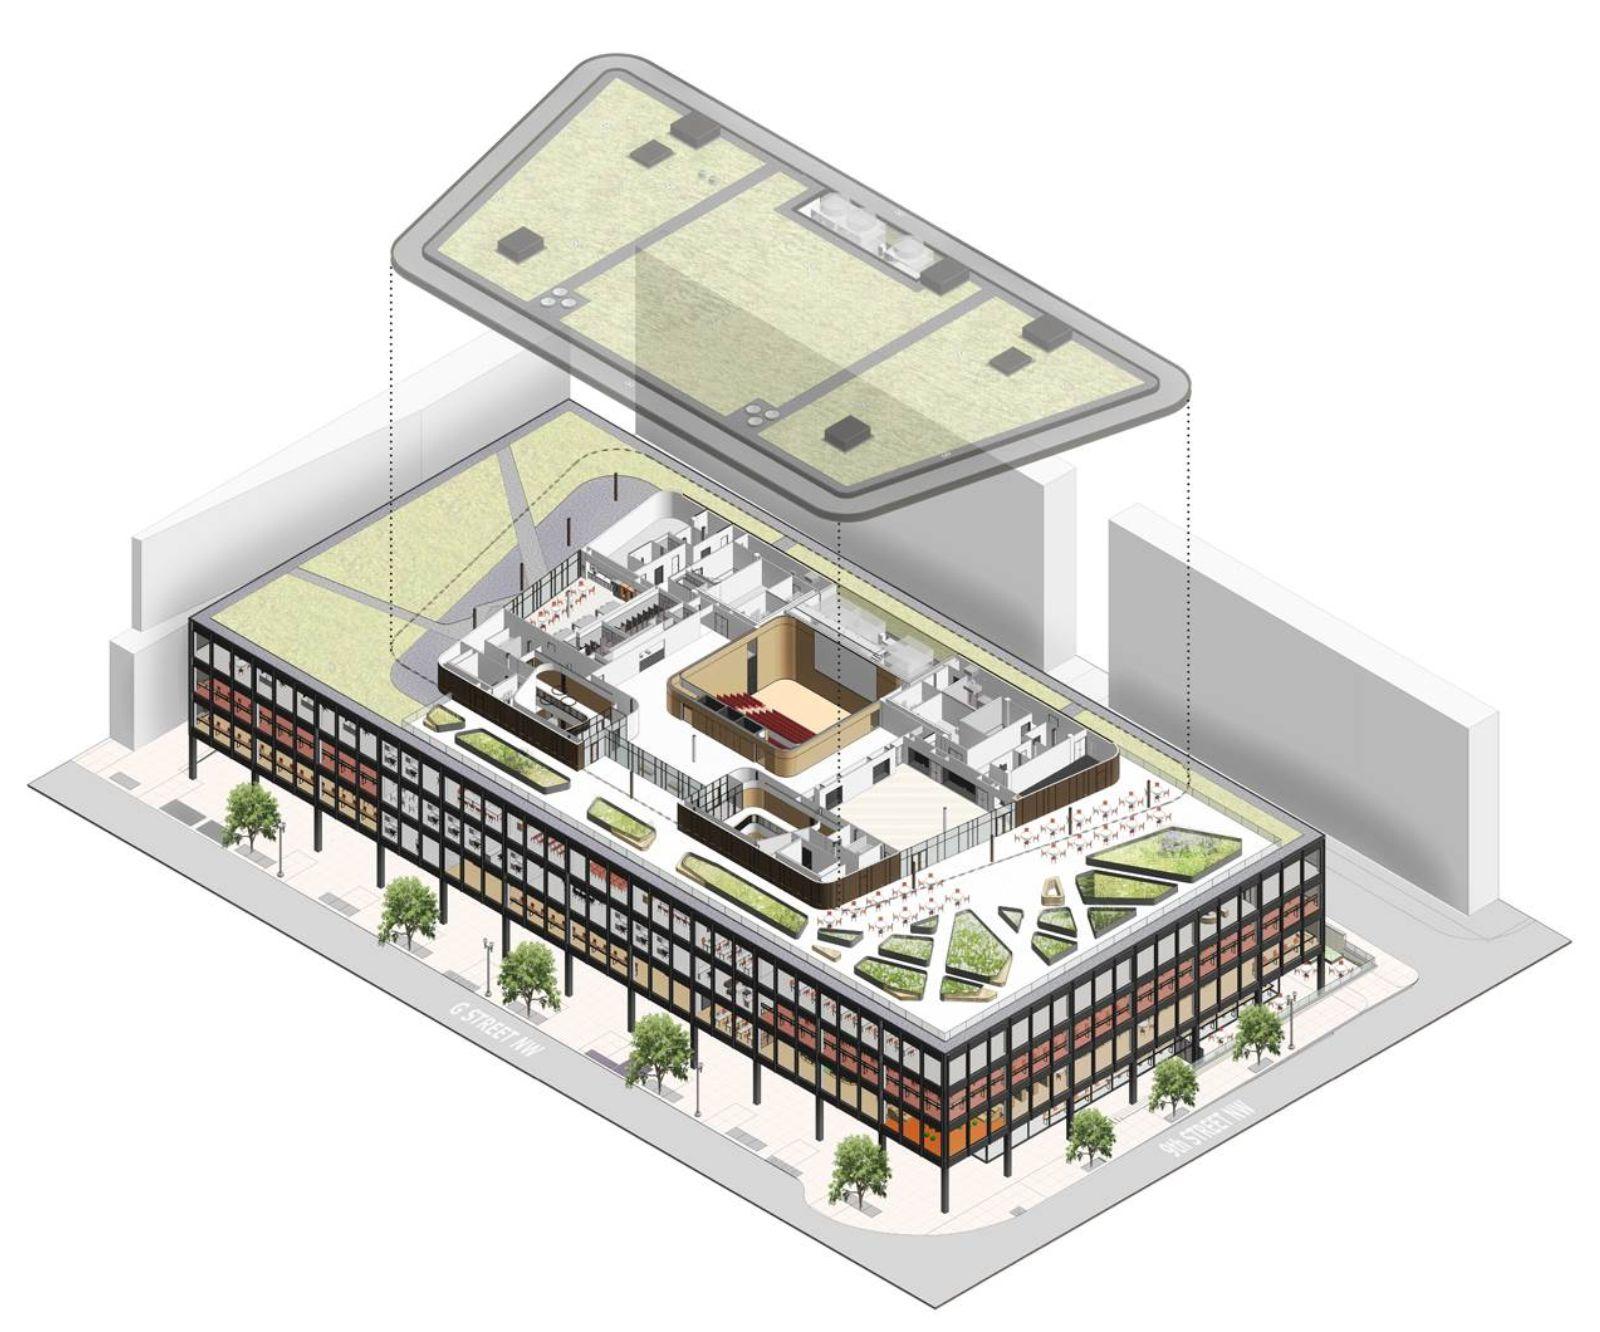 Renovating the Public Library of Washington D.C.